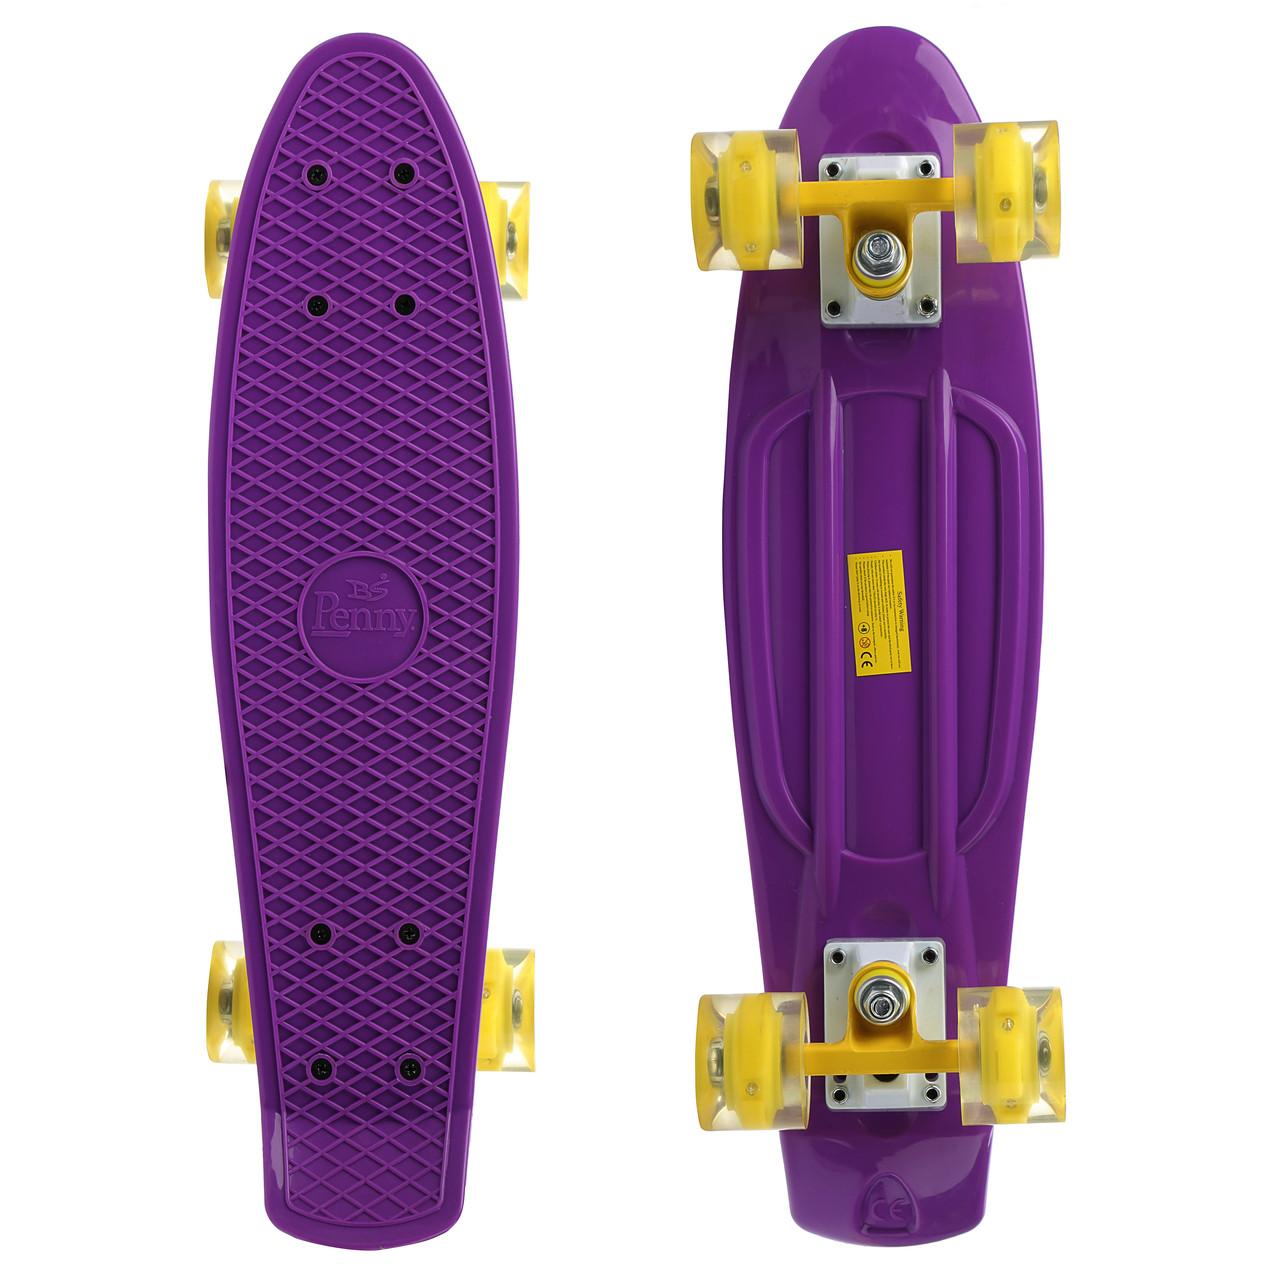 Пенни борд, скейтборд, Penny BS. Гарантия. Обслуживание